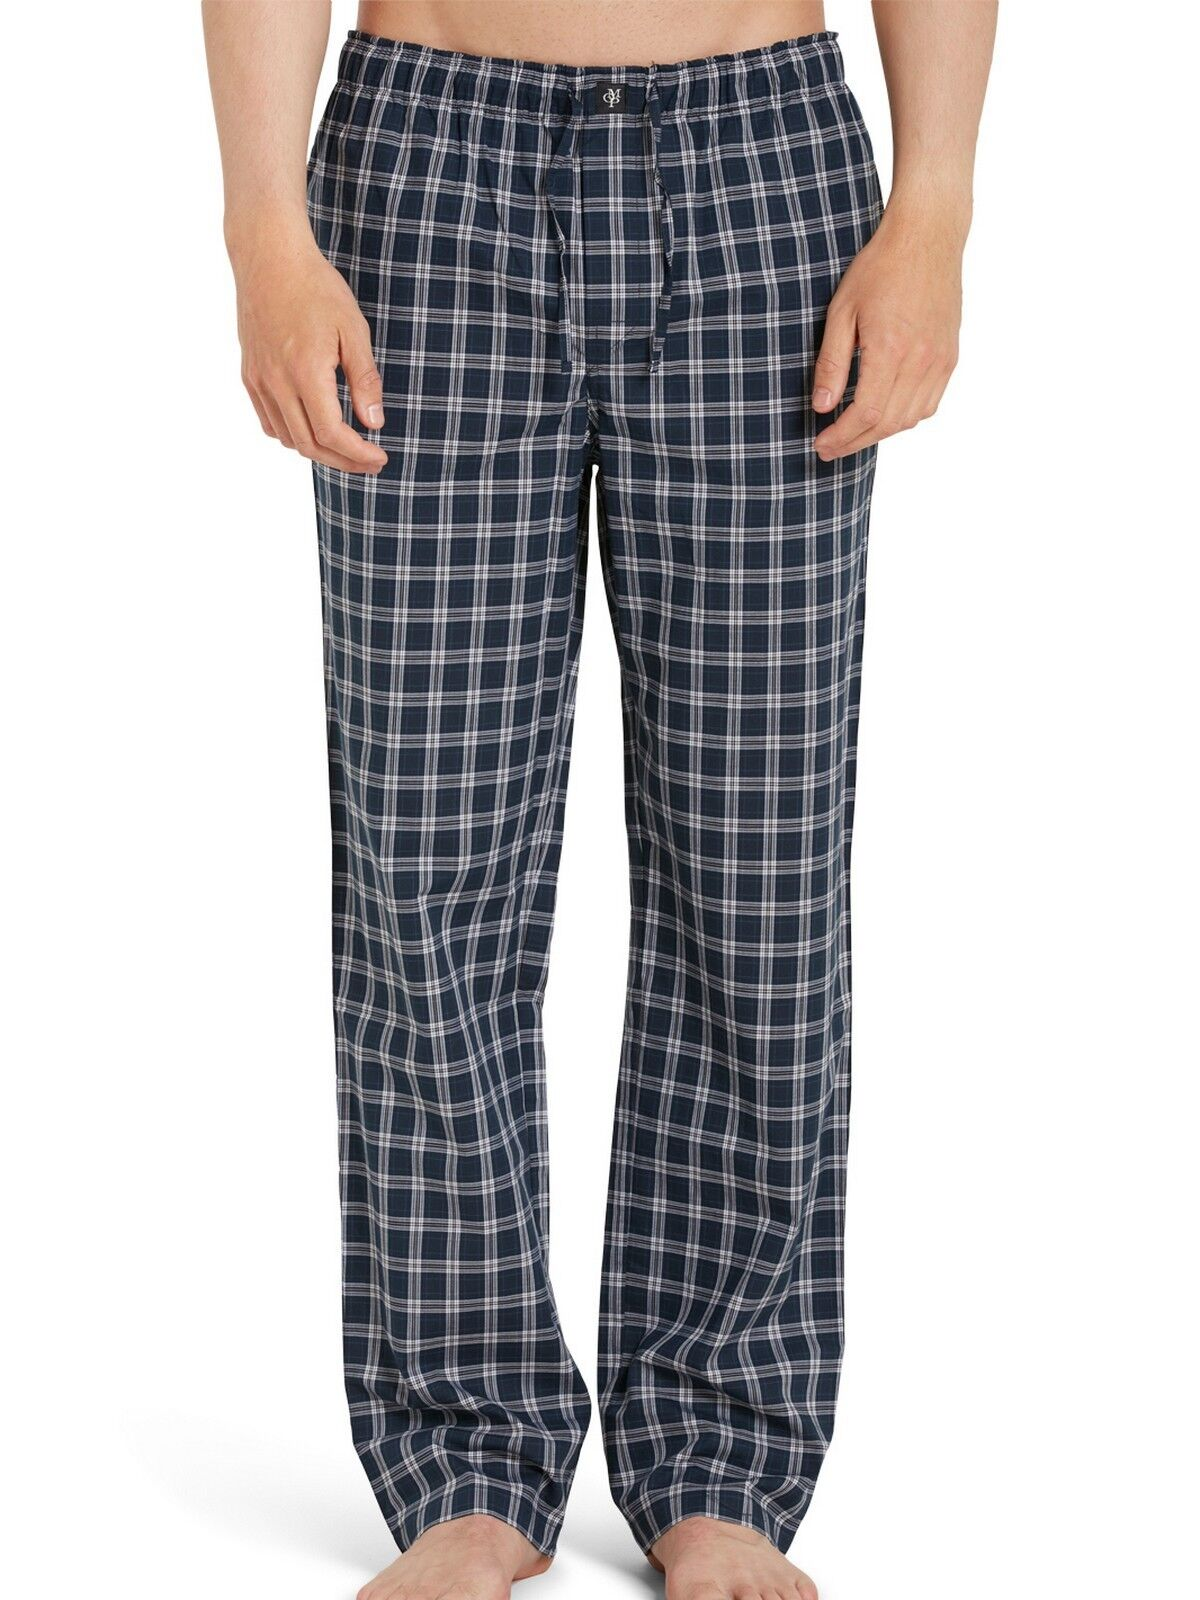 86f4a17eb4 Marc O'Polo Herren lange Pyjamahose Schlafanzughose Pants Lang - 154519 ...